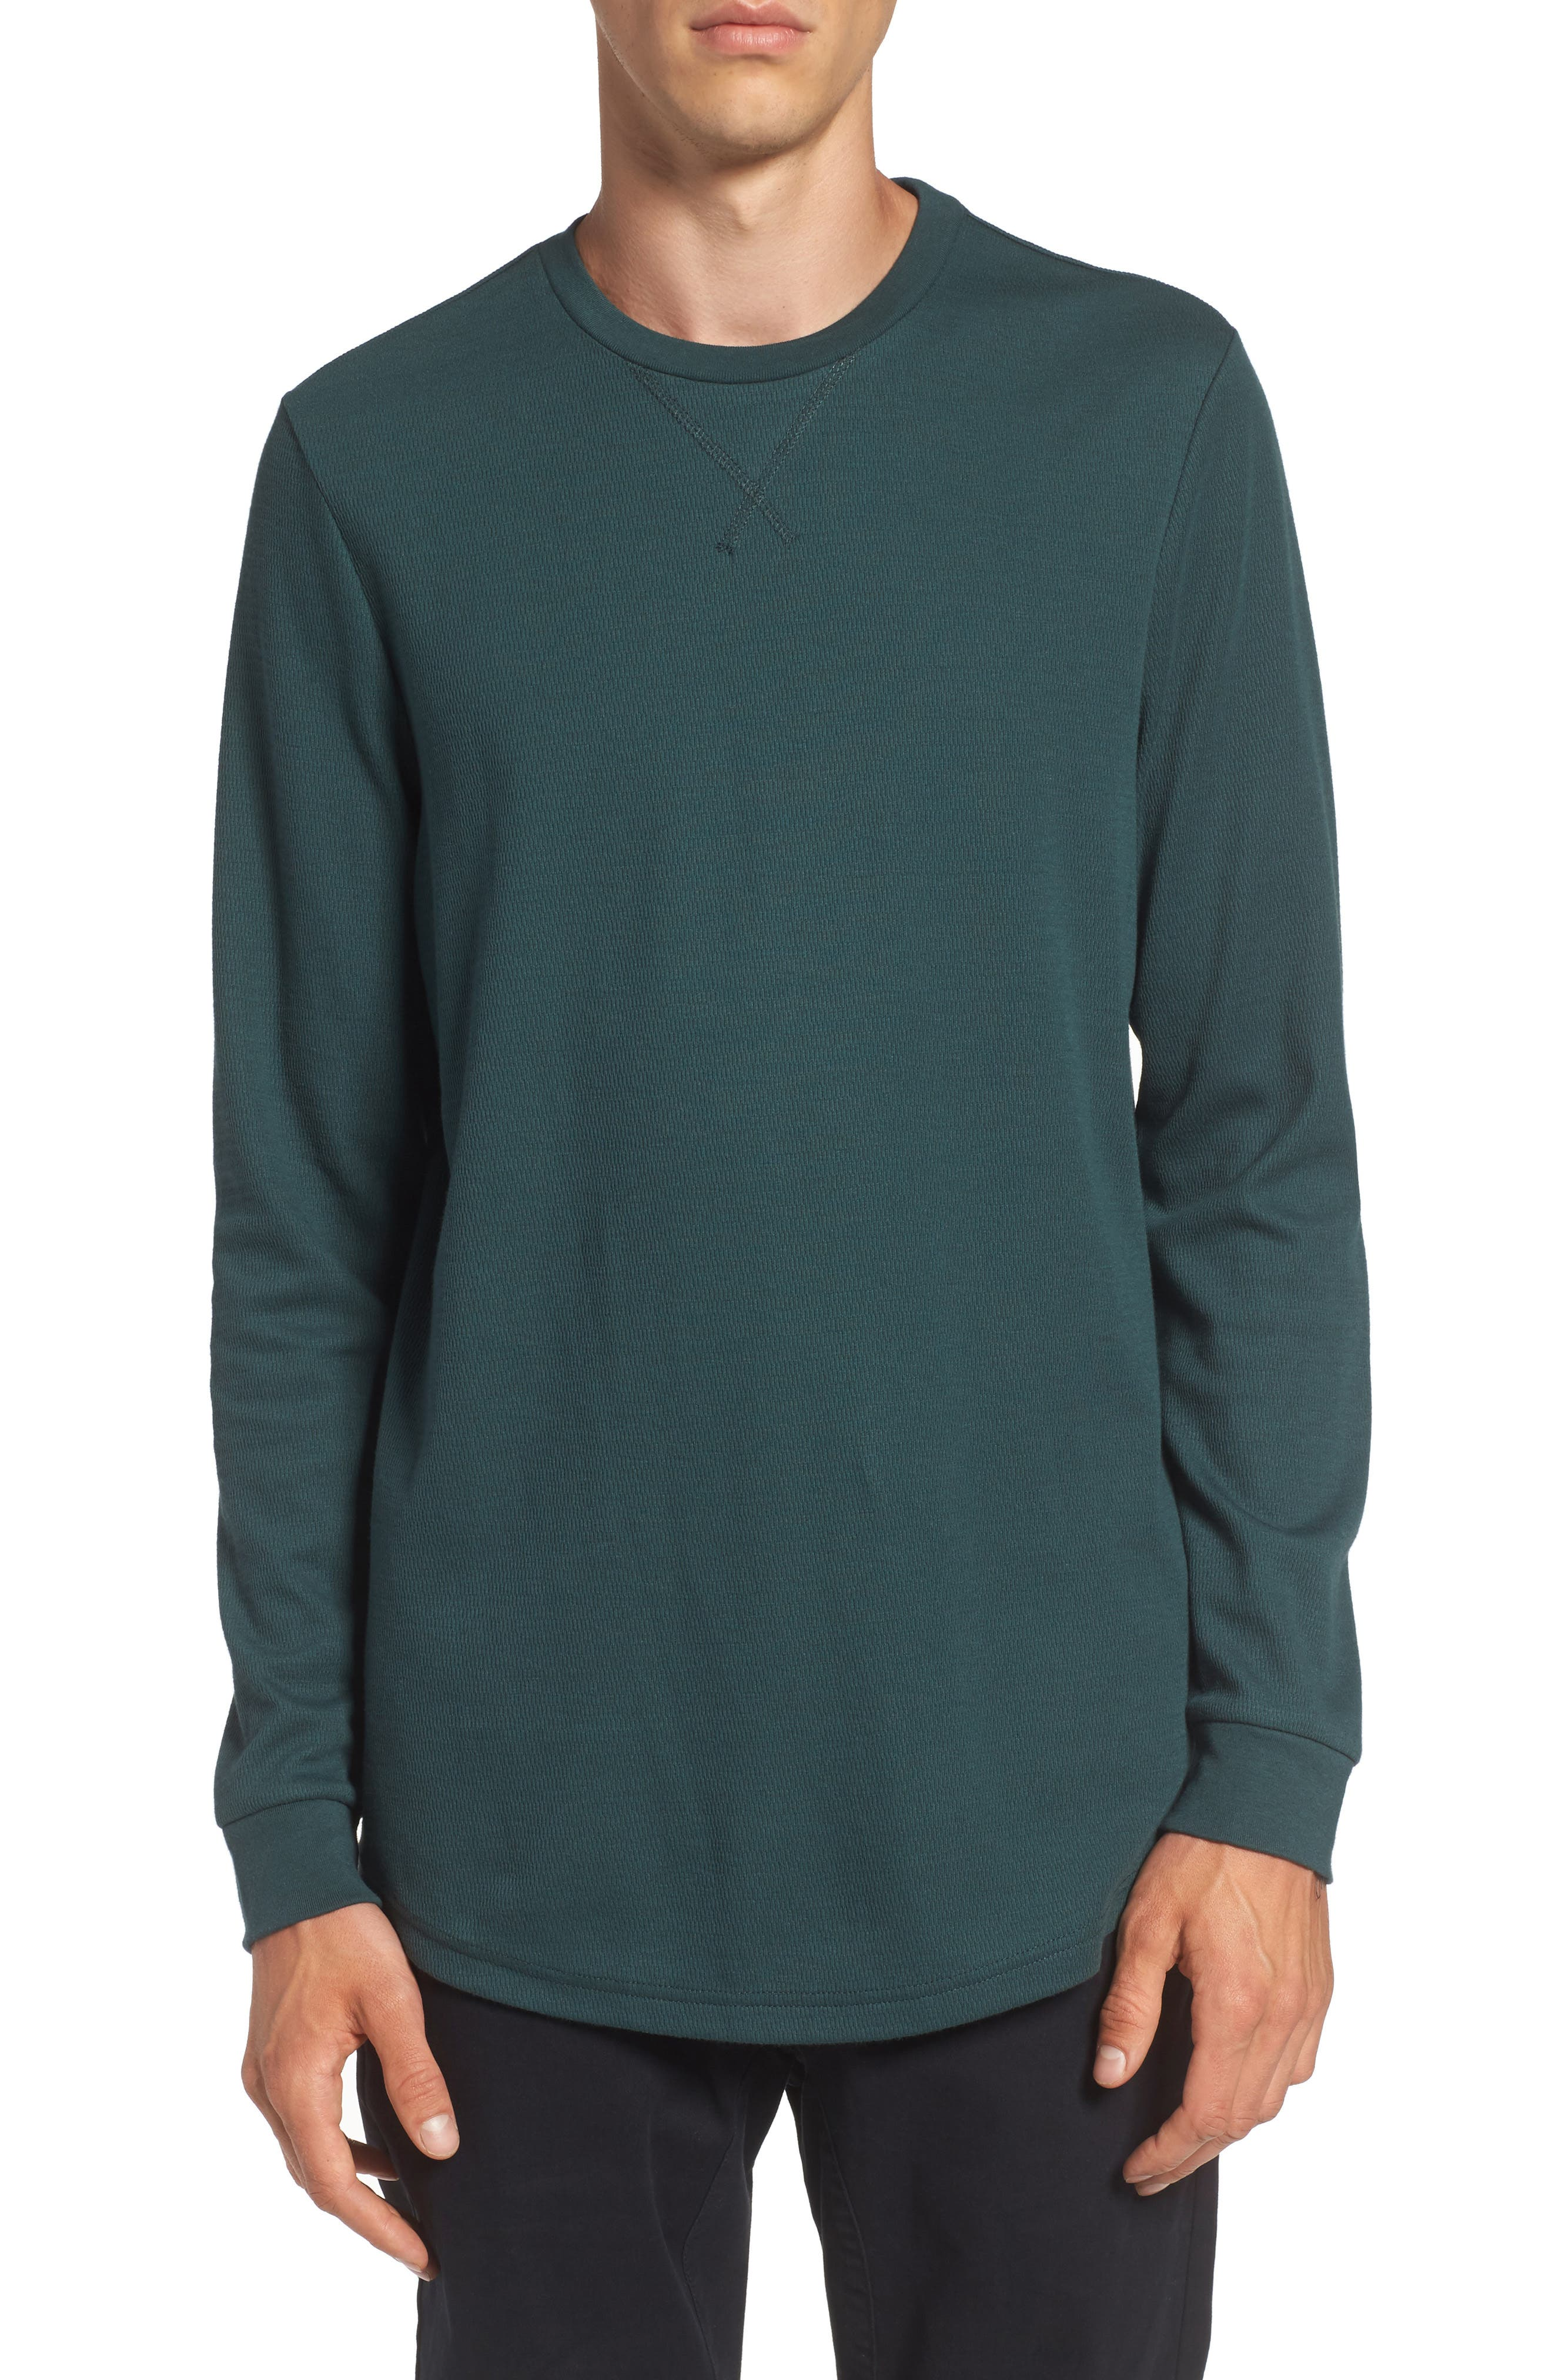 Main Image - The Rail Longline Thermal T-Shirt